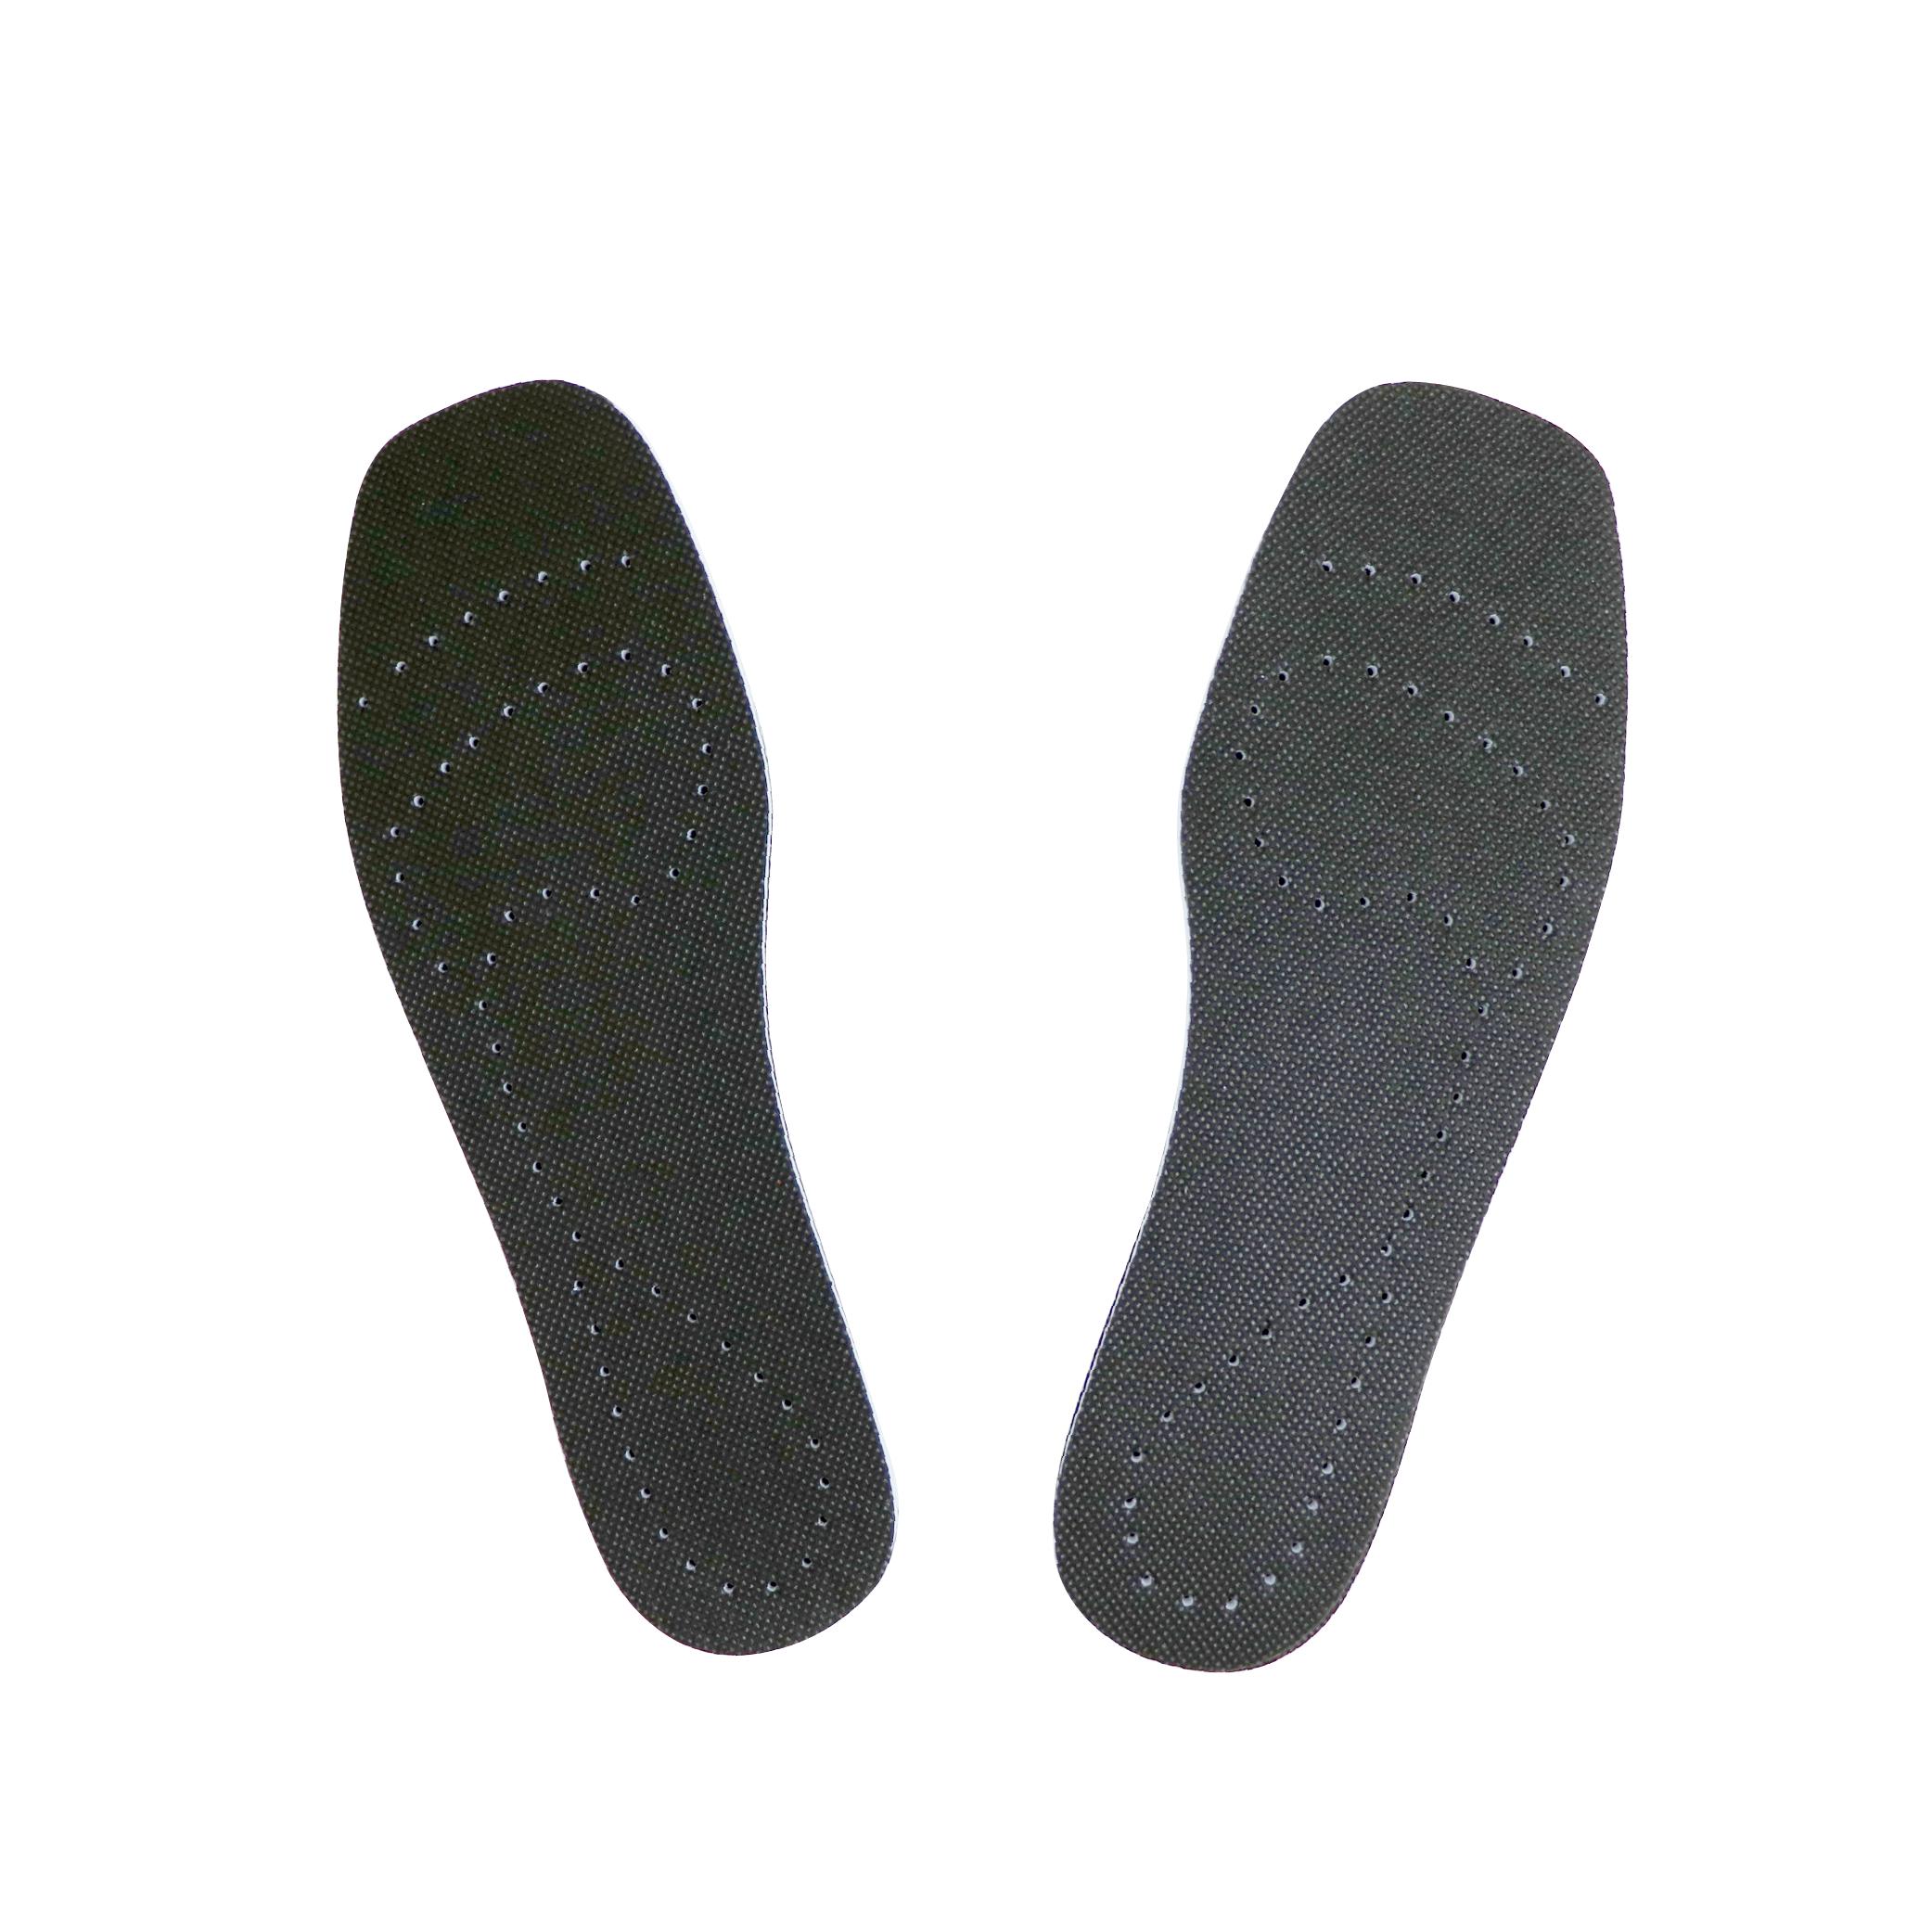 鞋墊男1-01.png